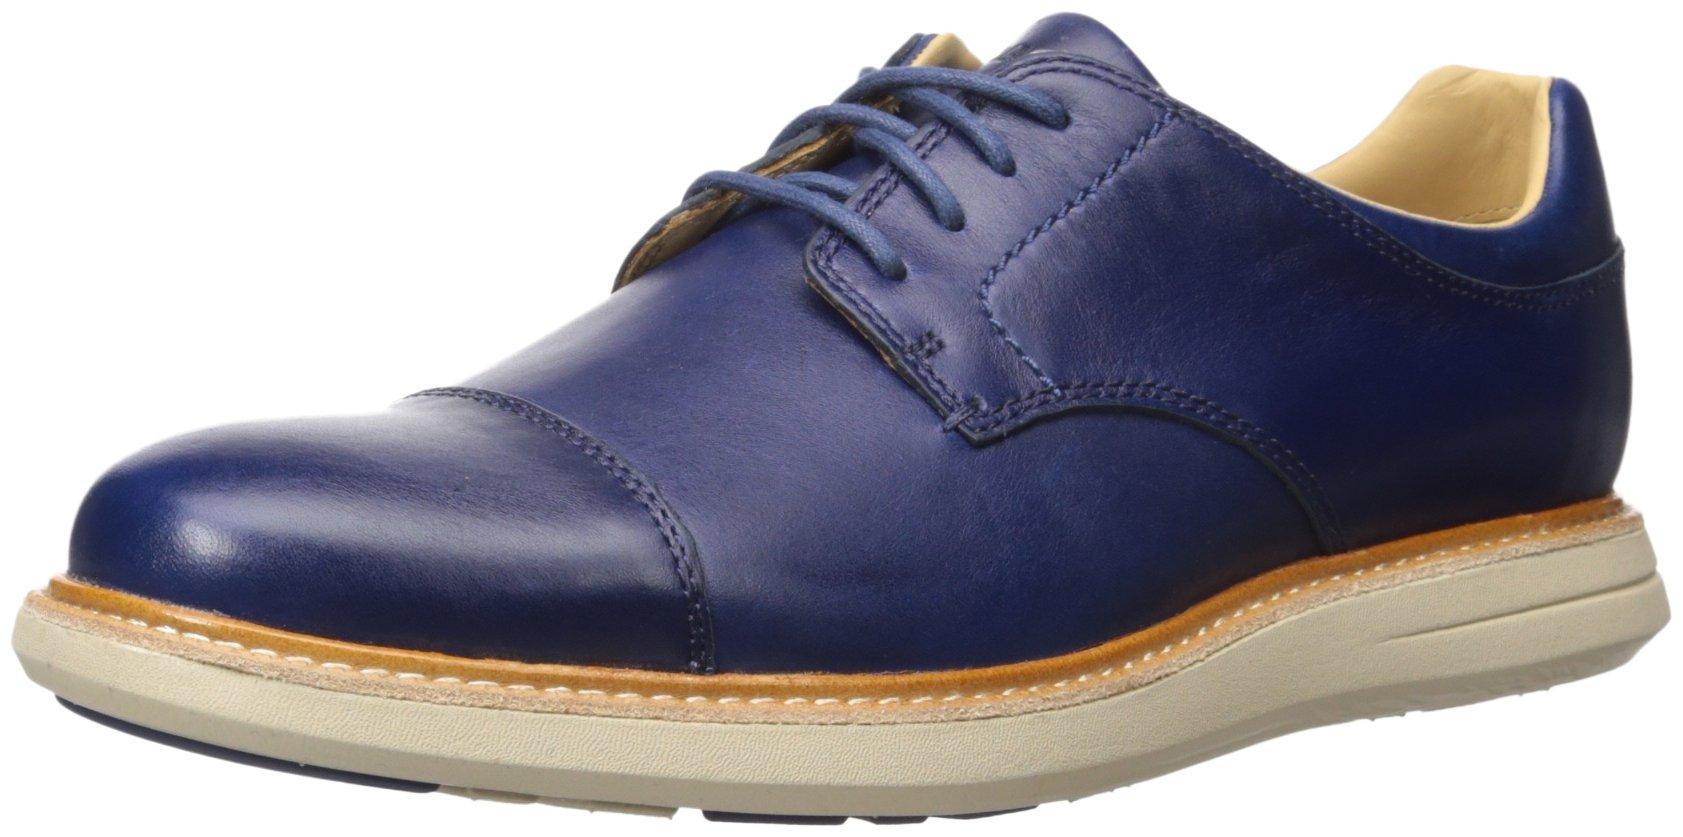 Sebago Men's Smyth Cap Toe Oxford, Navy Leather, 9 M US